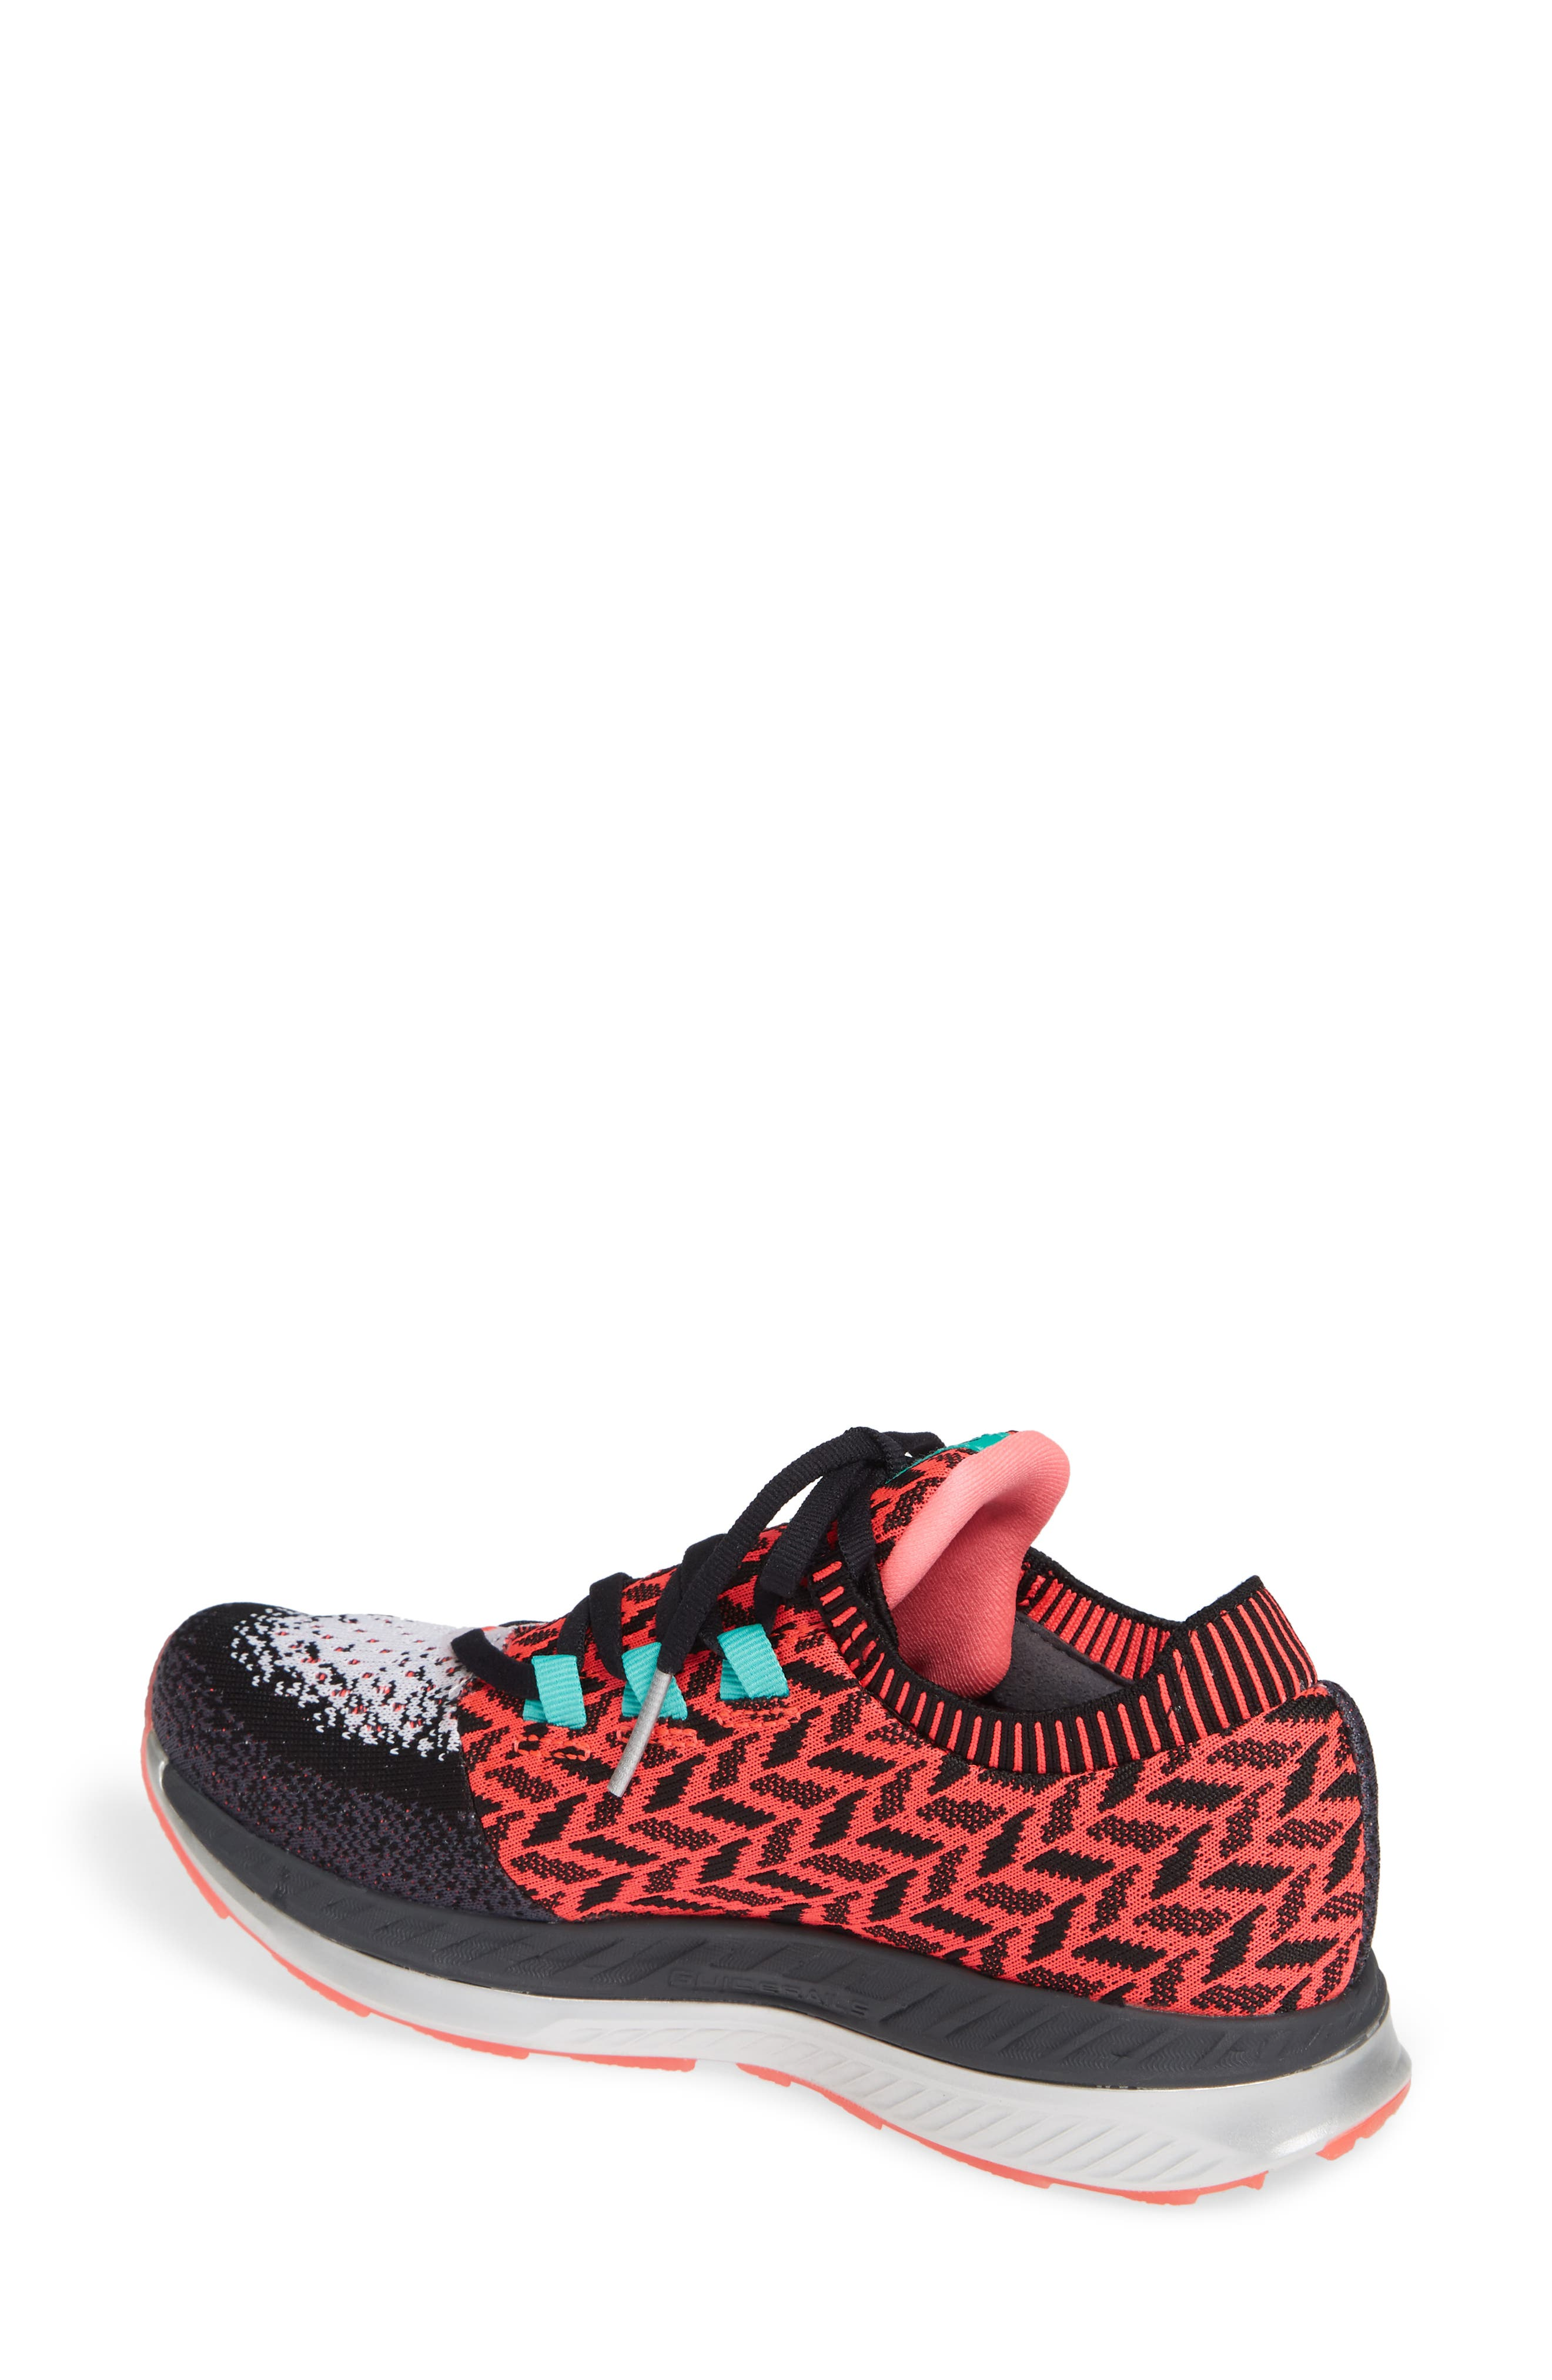 BROOKS, Bedlam Running Shoe, Alternate thumbnail 2, color, PINK/ BLACK/ WHITE